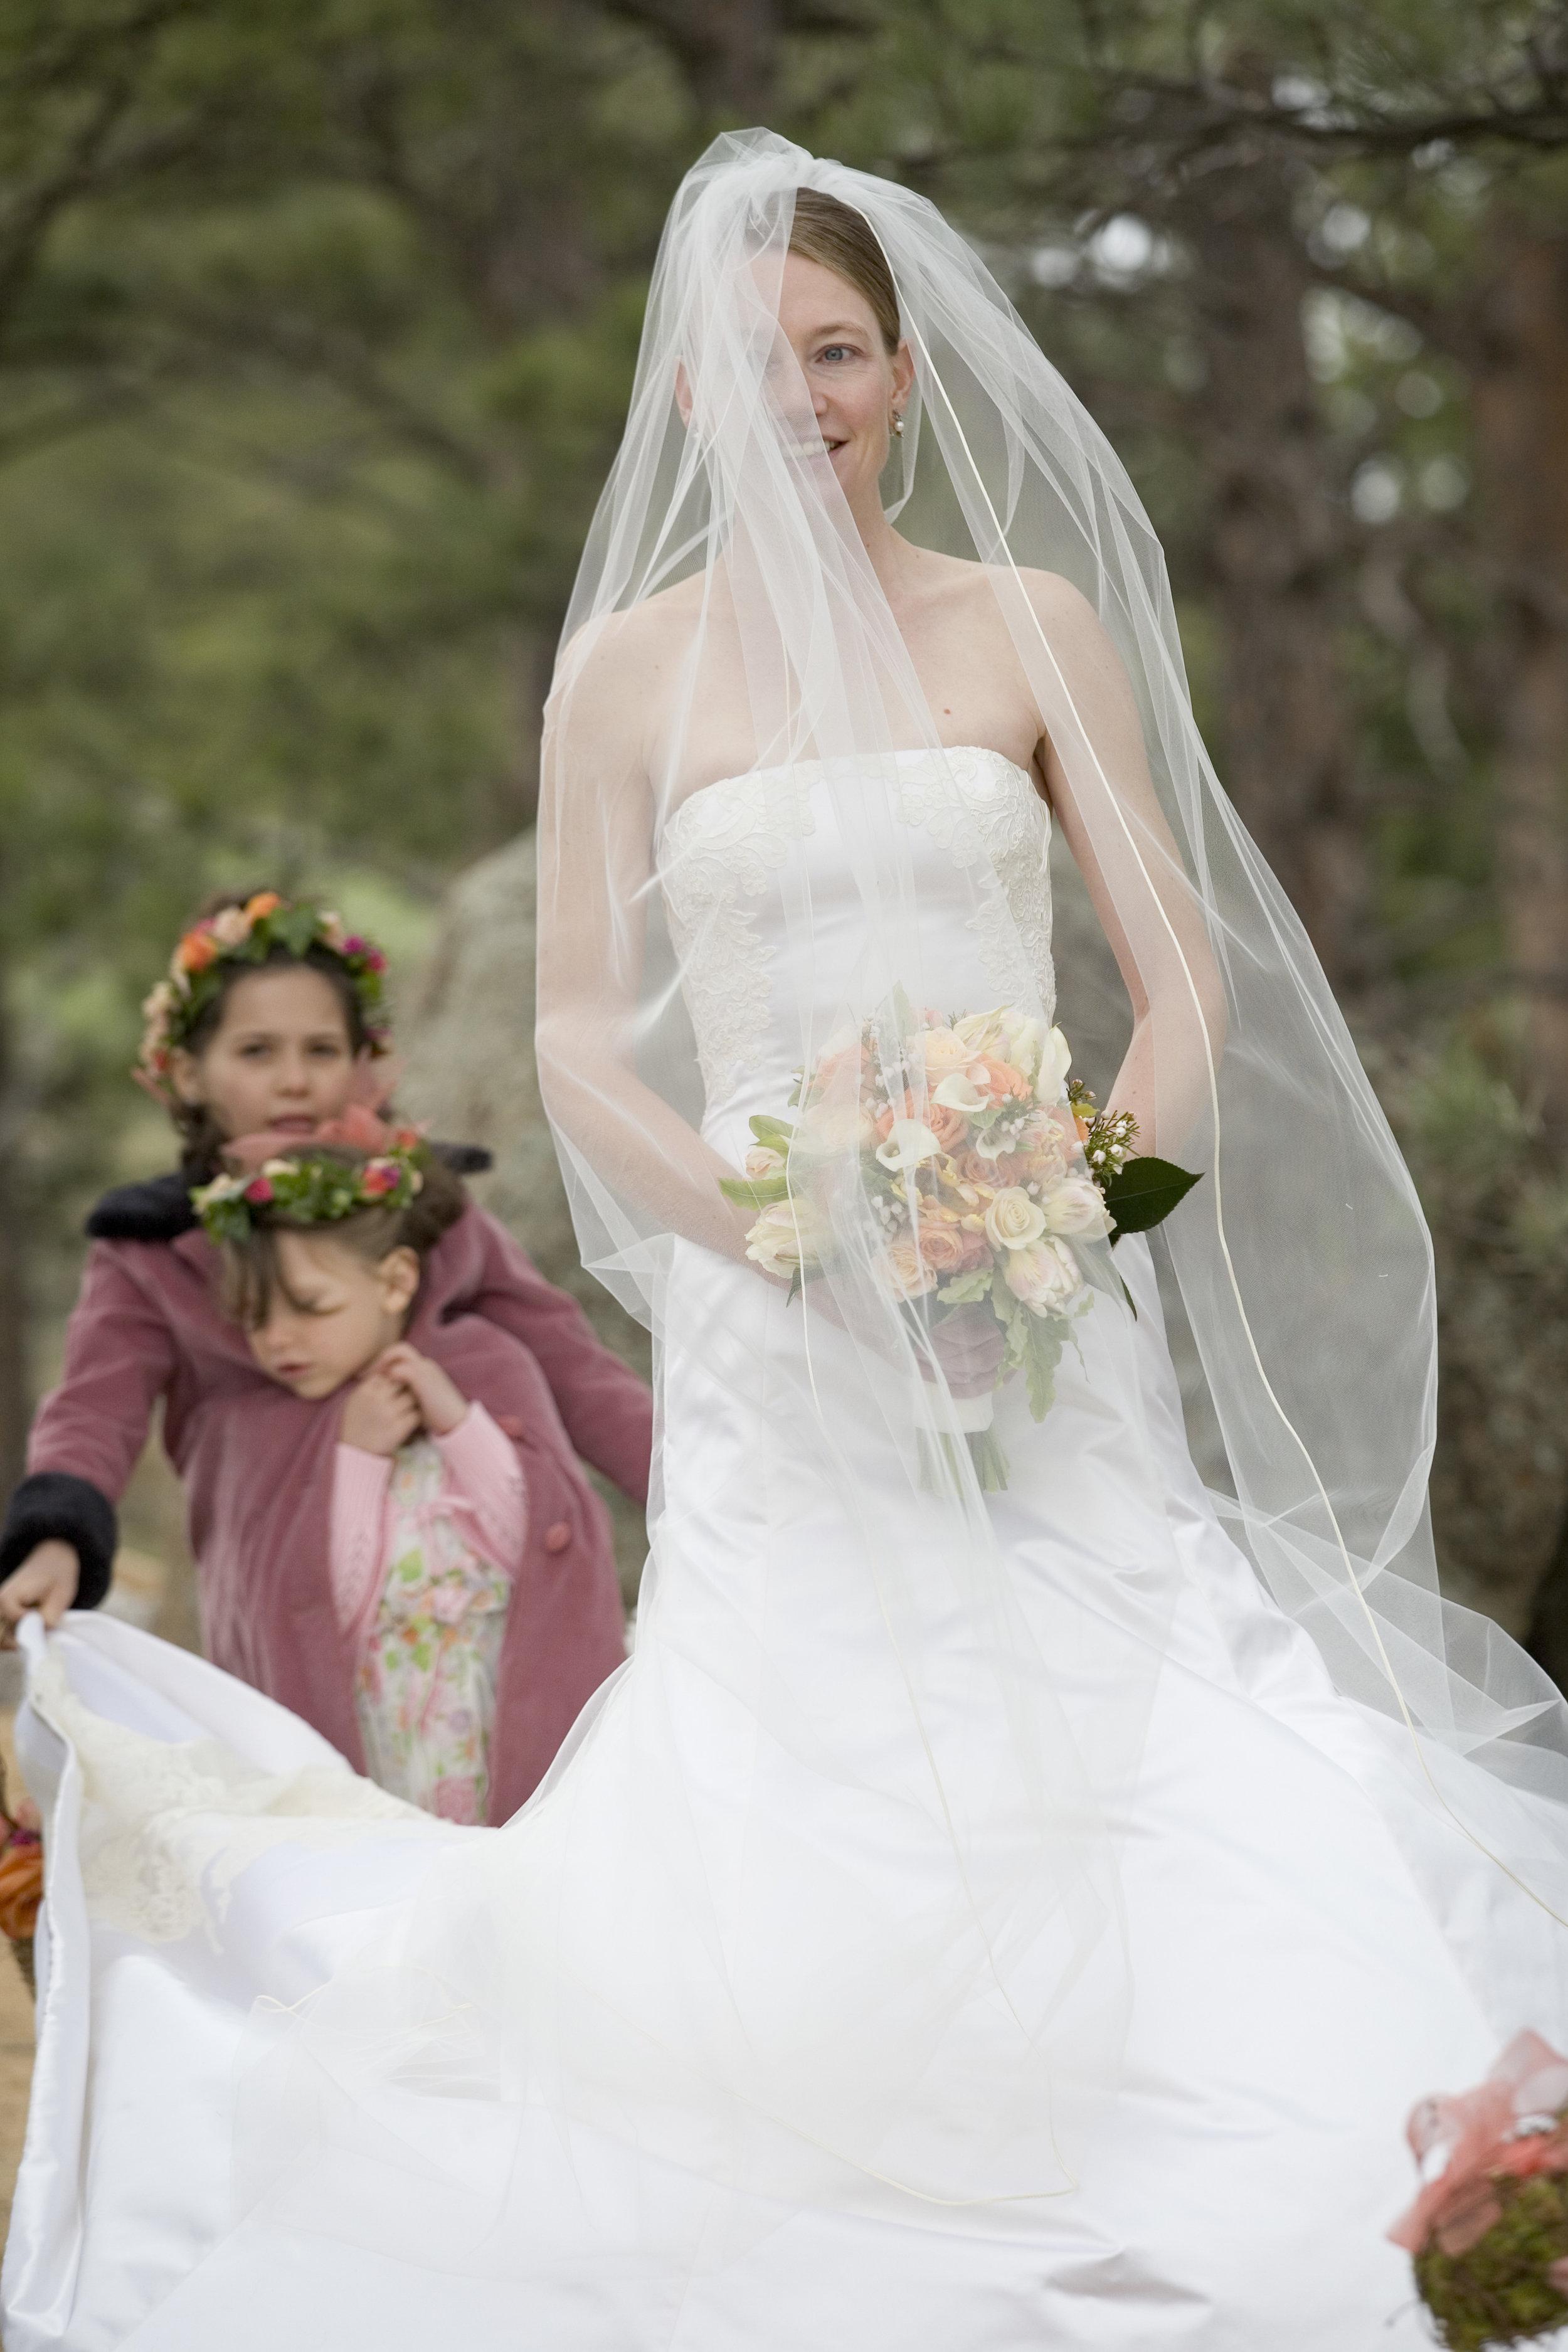 Boulder Wedding Photographer - Toni Axelrod